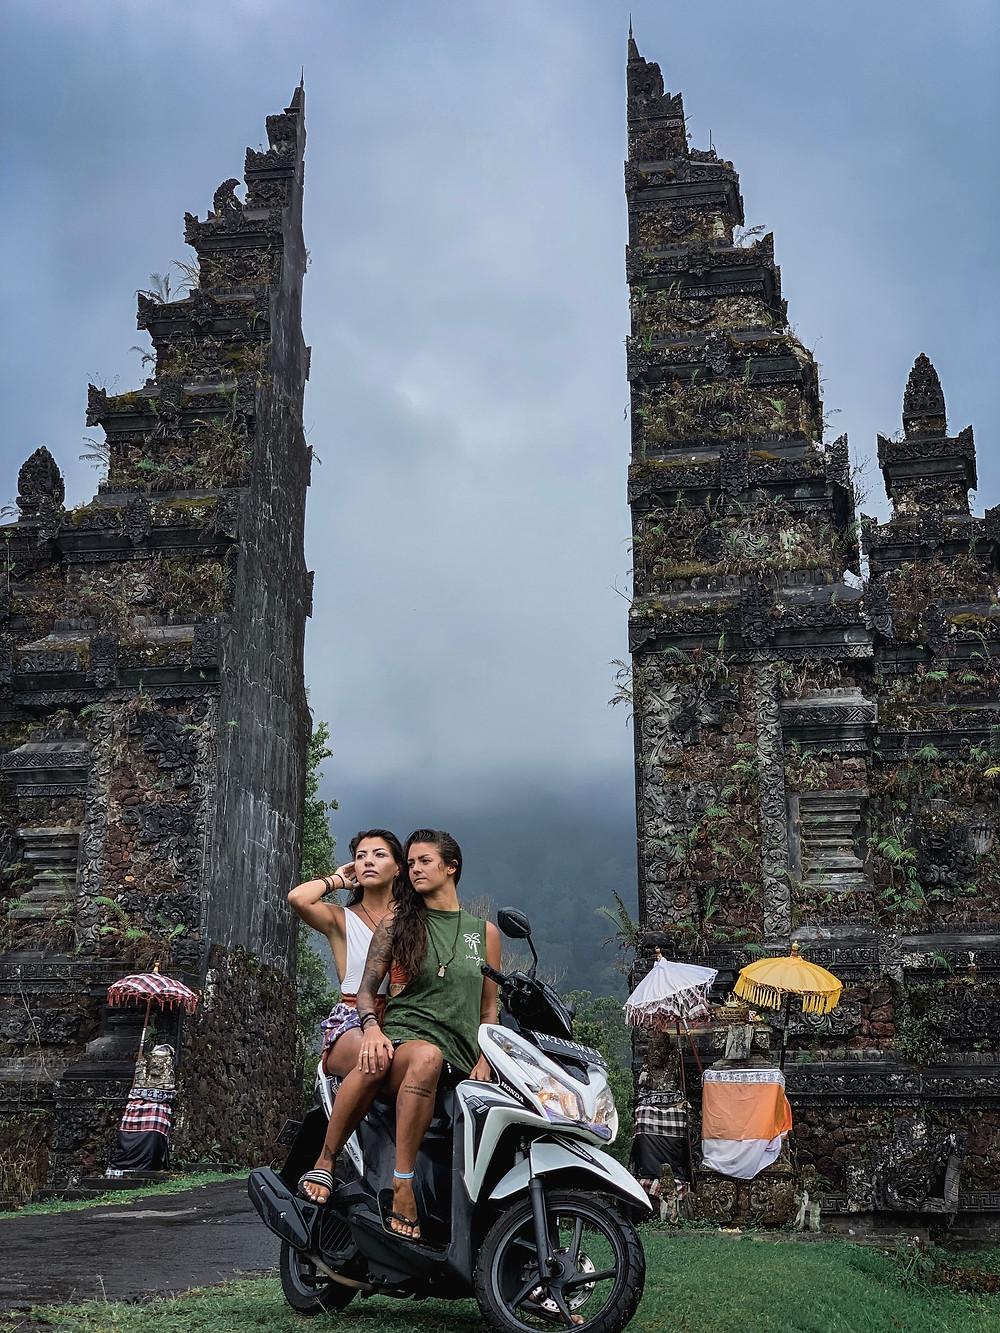 Gates of Herrada in Ubud, Bali | On Airplane Mode